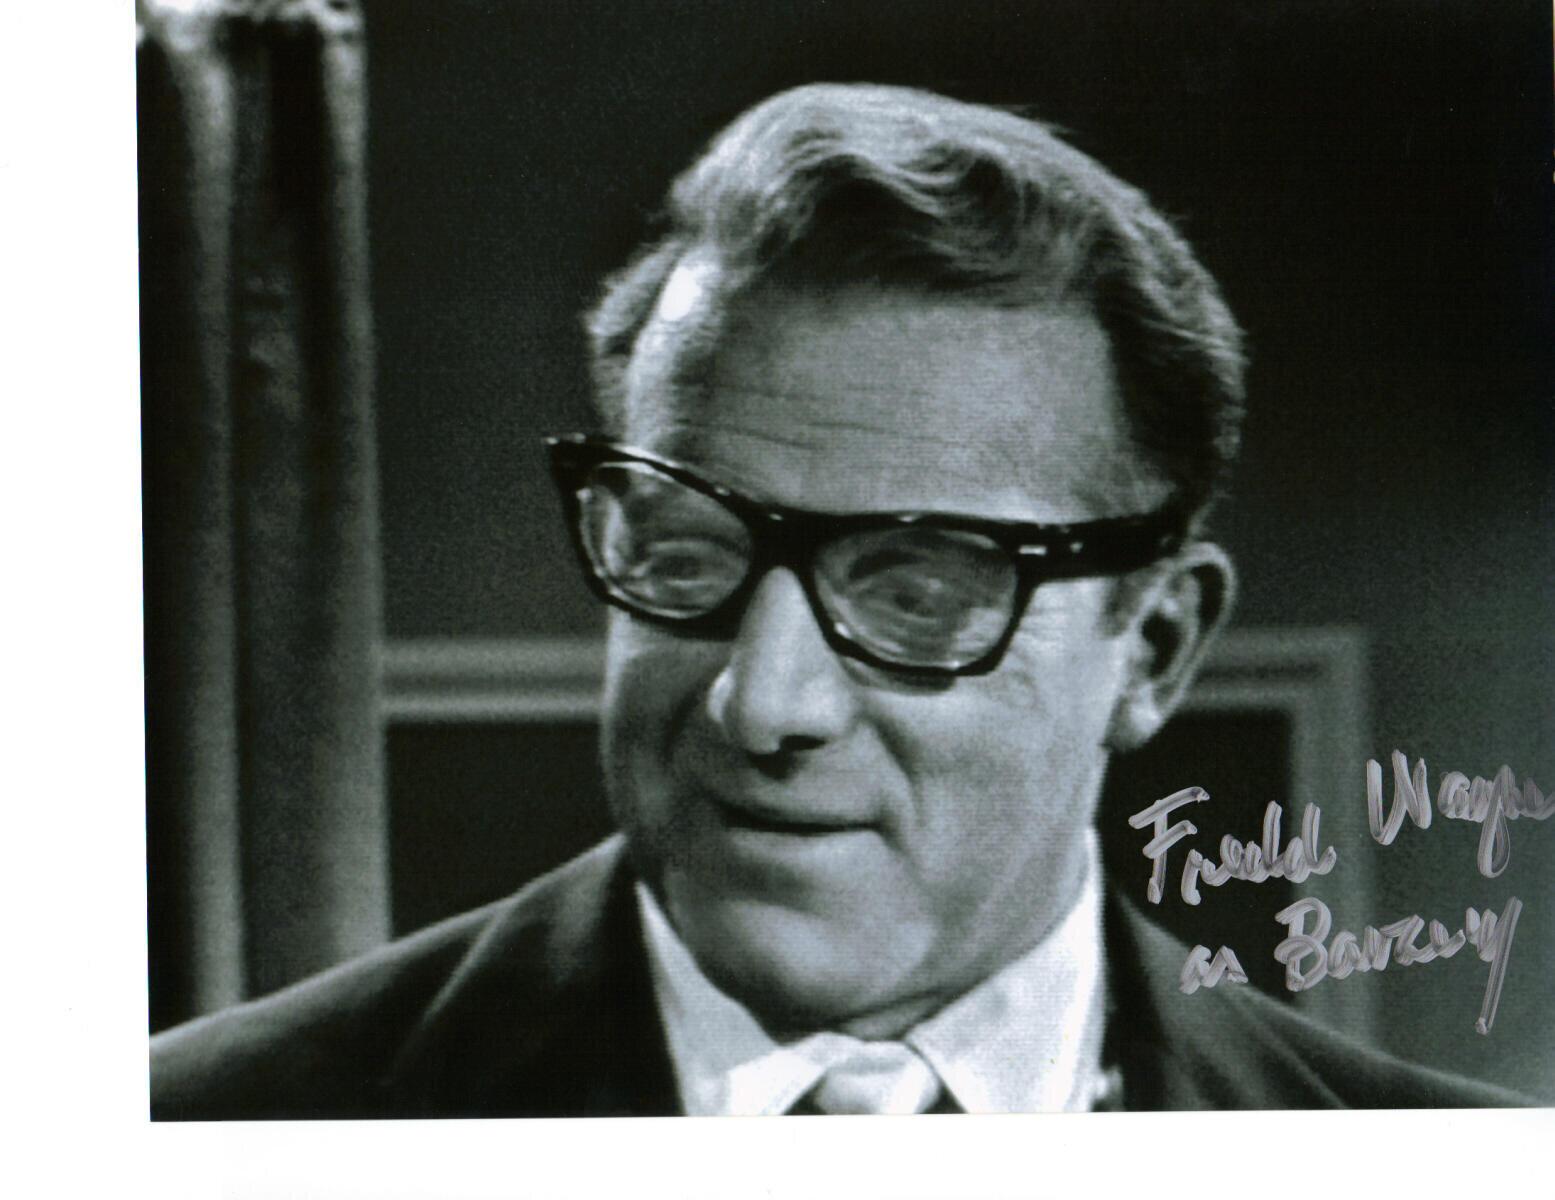 Fredd Wayne (1924-2018) Twilight Zone 8X10 #2